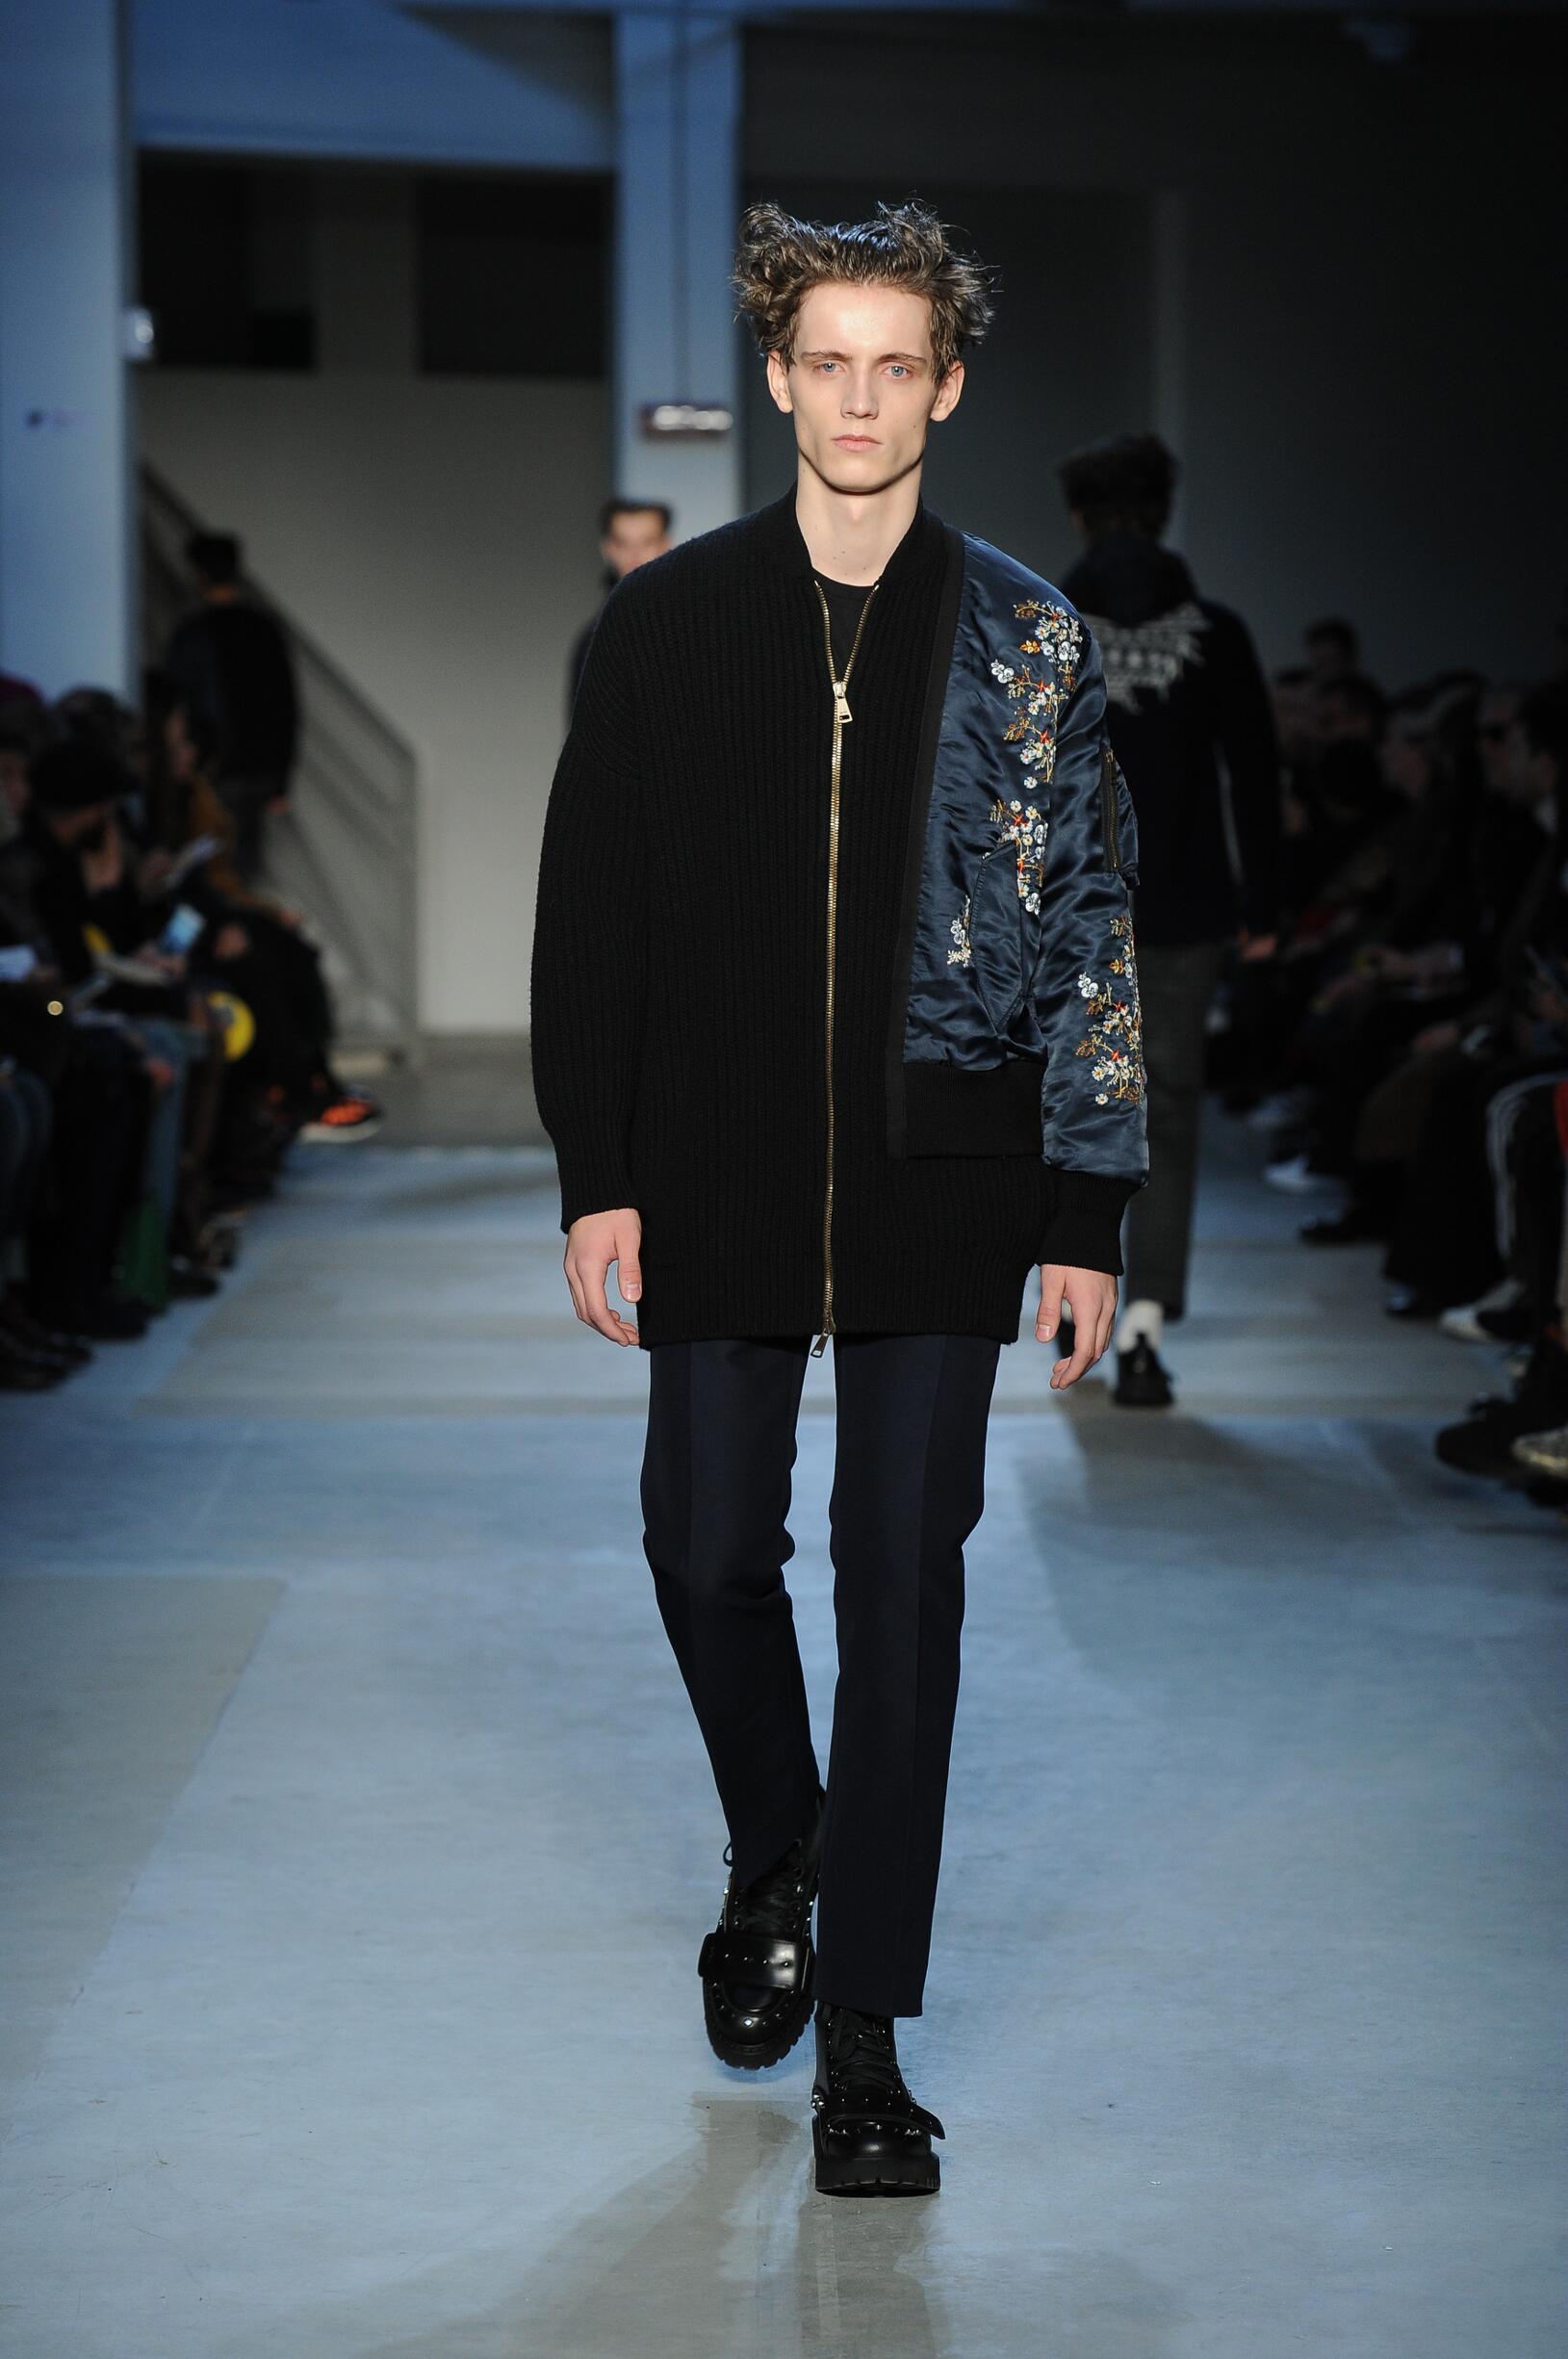 Catwalk N°21 Man Fashion Show Winter 2017